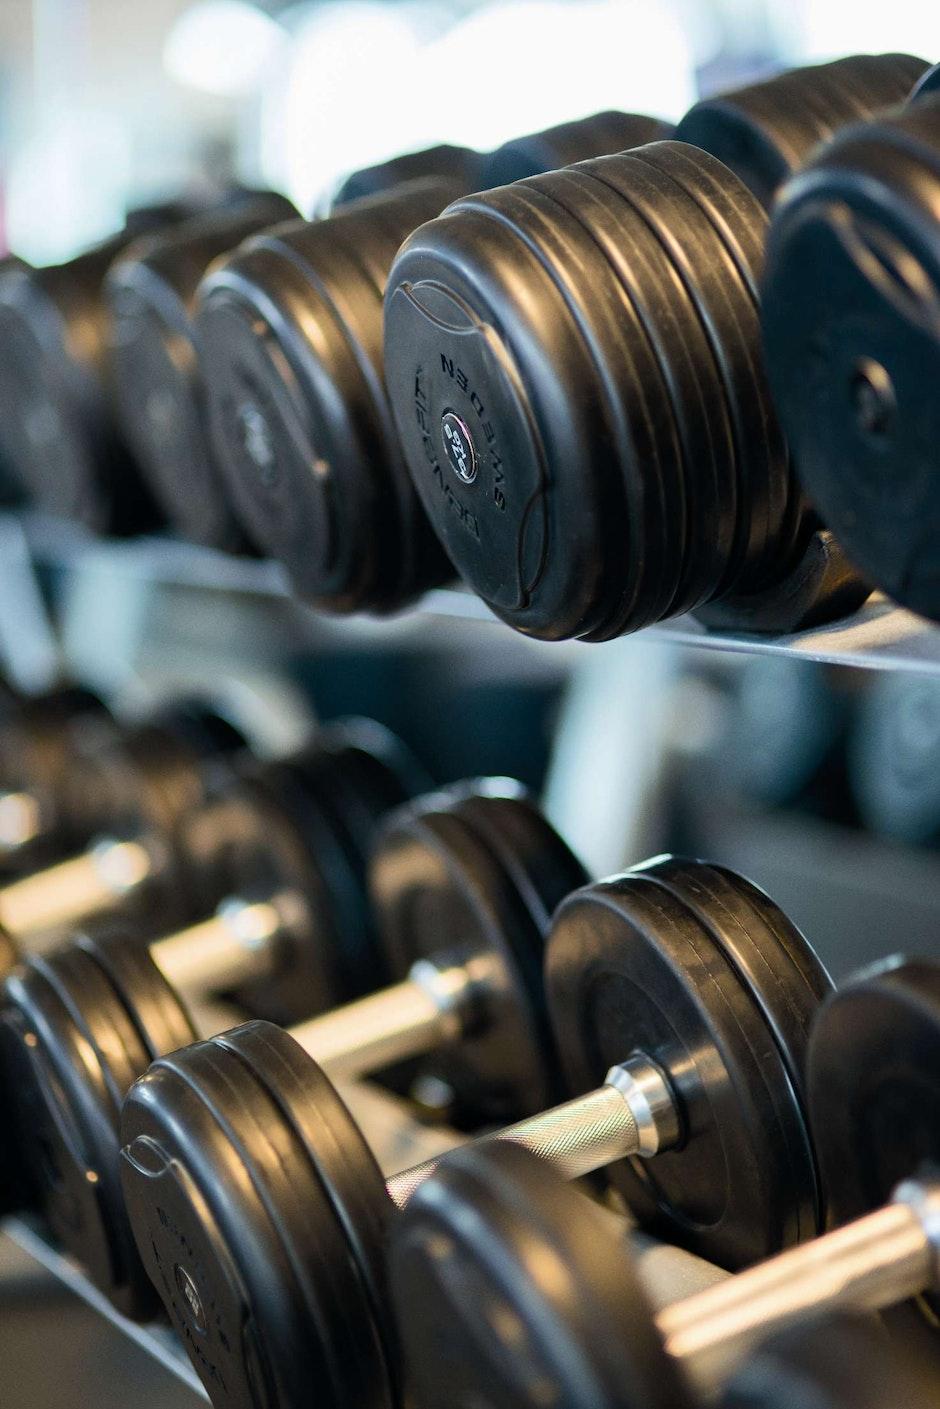 bodybuilding, close-up, dumbbells